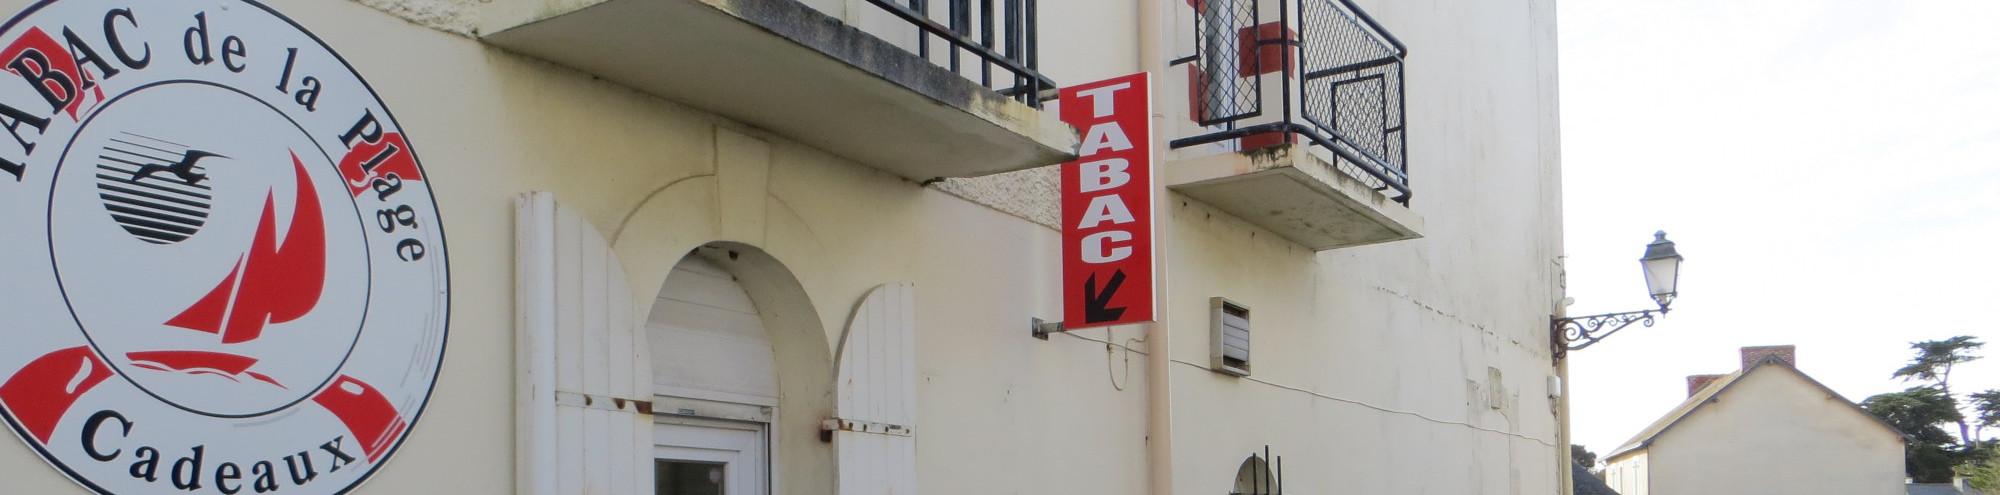 Bandeau de la page 'Tabac Presse